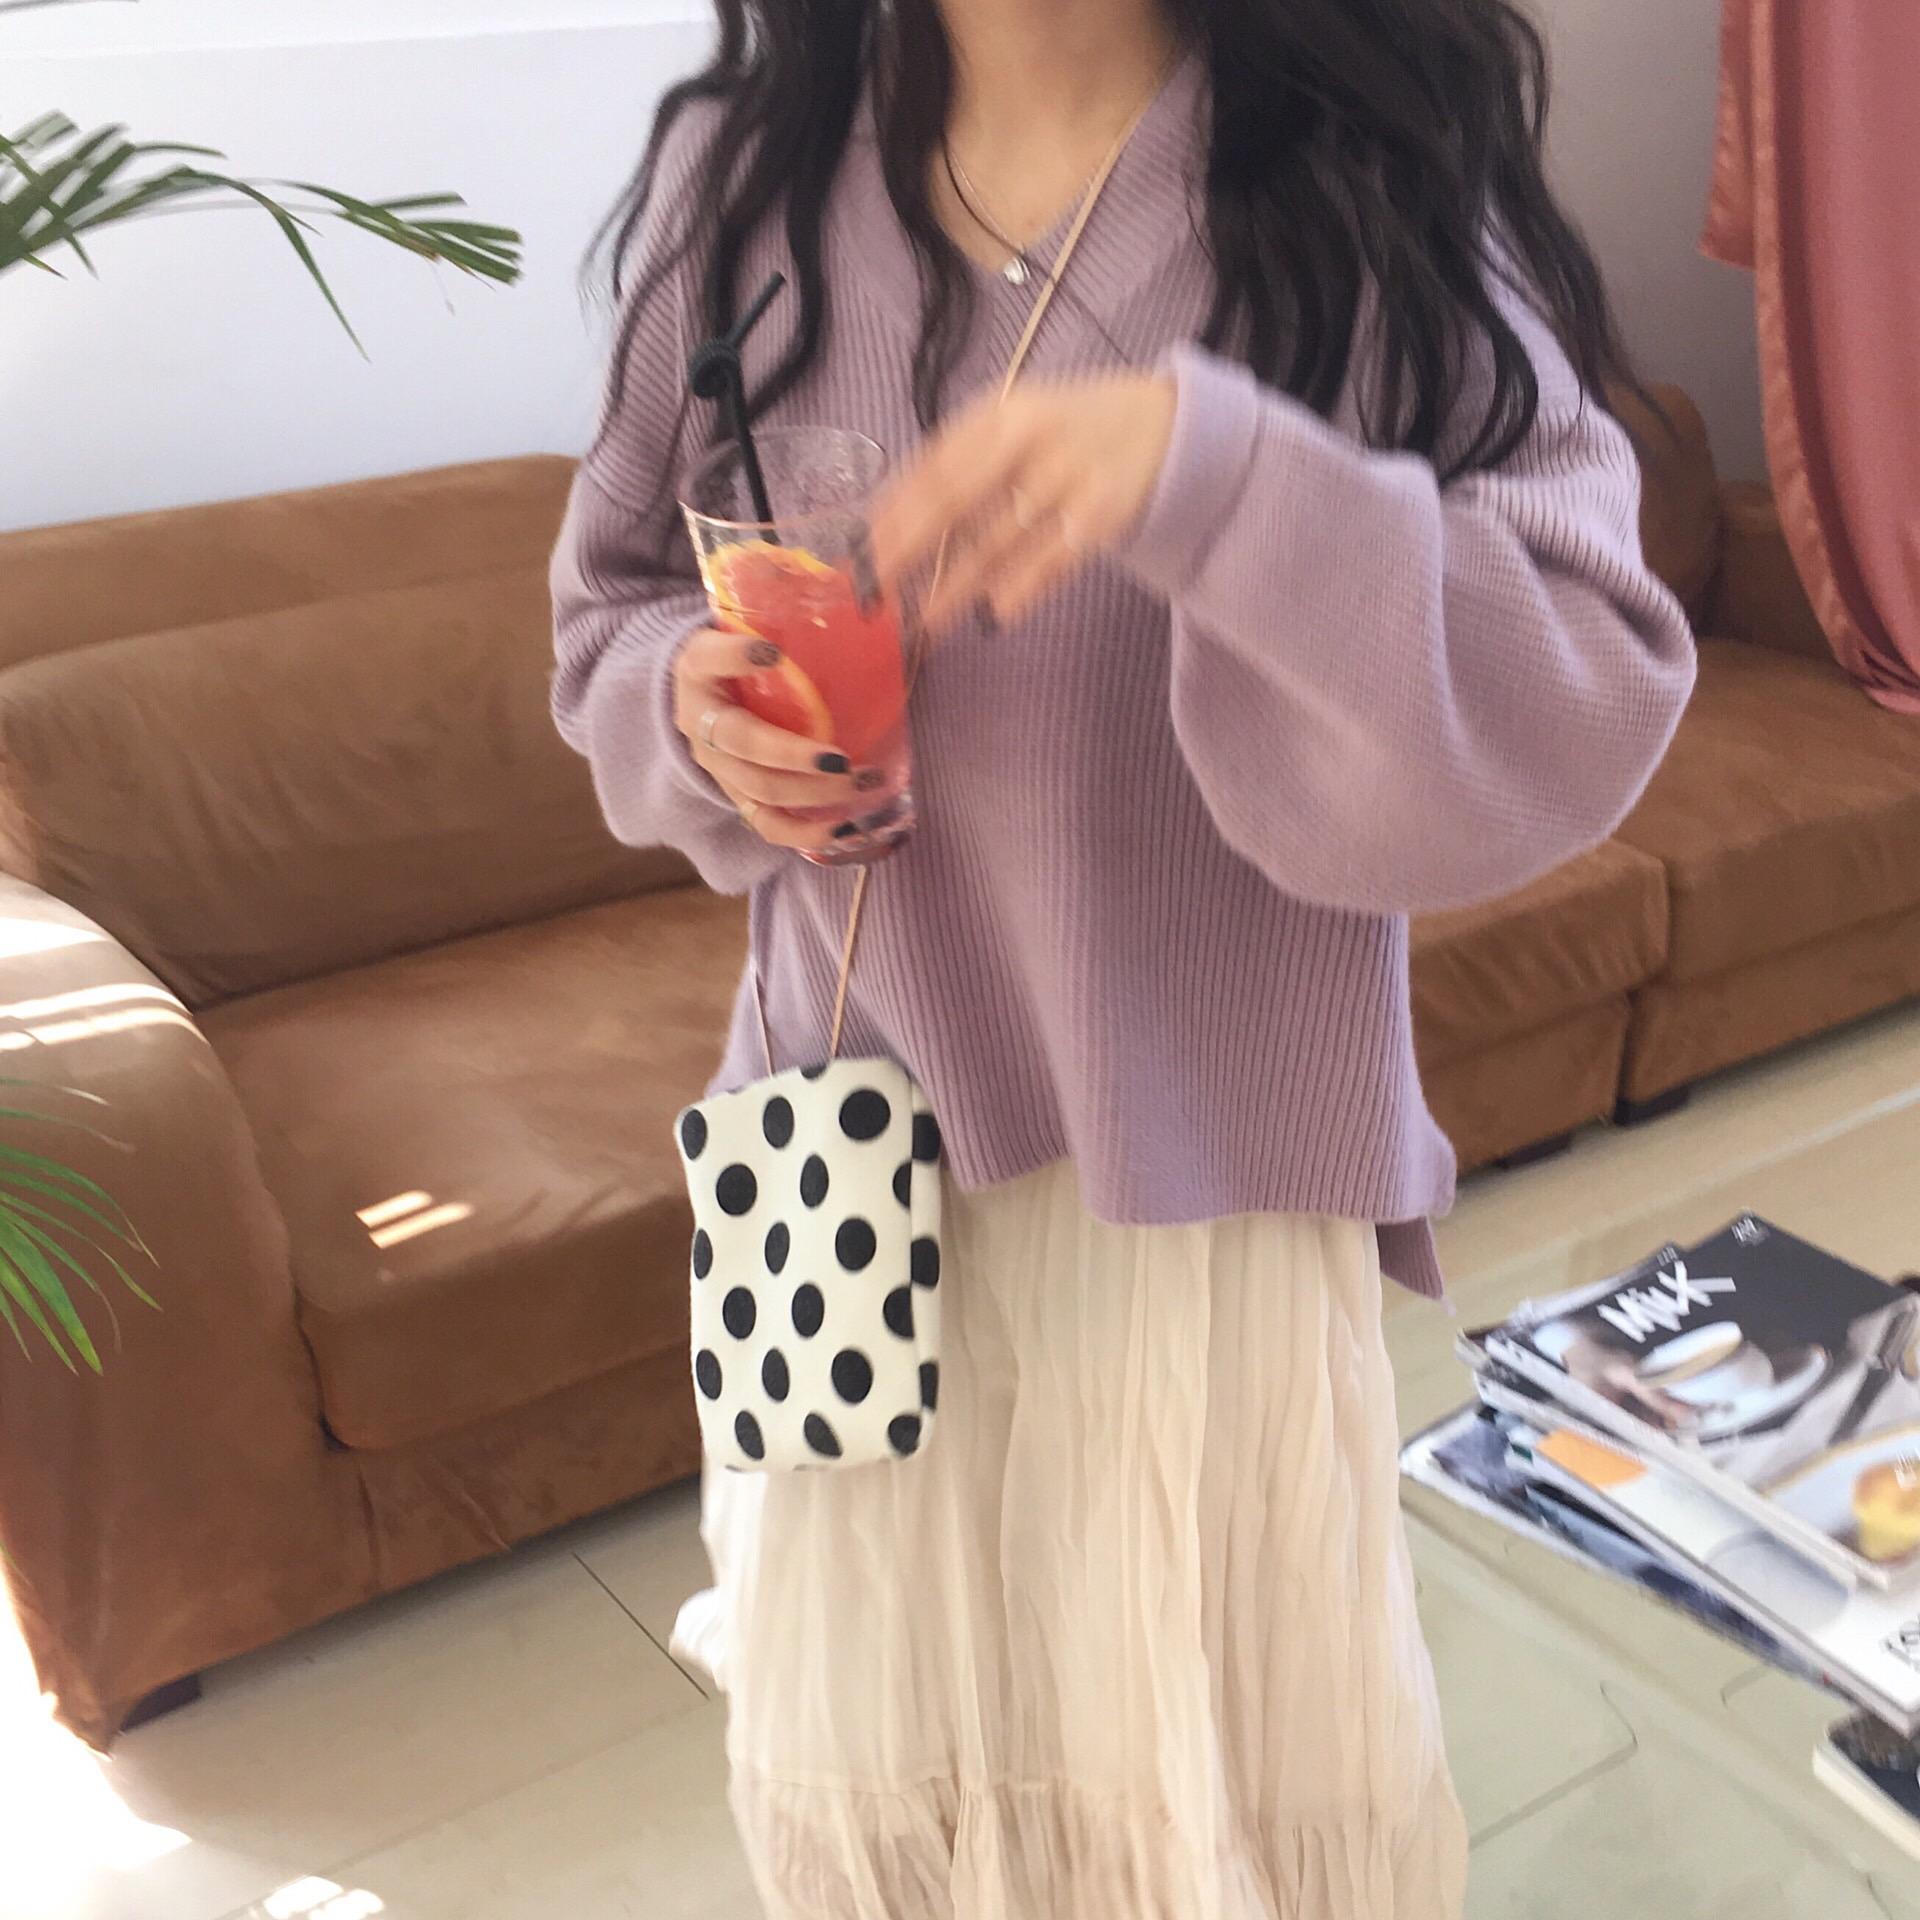 [Busan]香芋紫慵懒针织衫女chic韩范温柔v领宽松毛衣2018秋冬新款